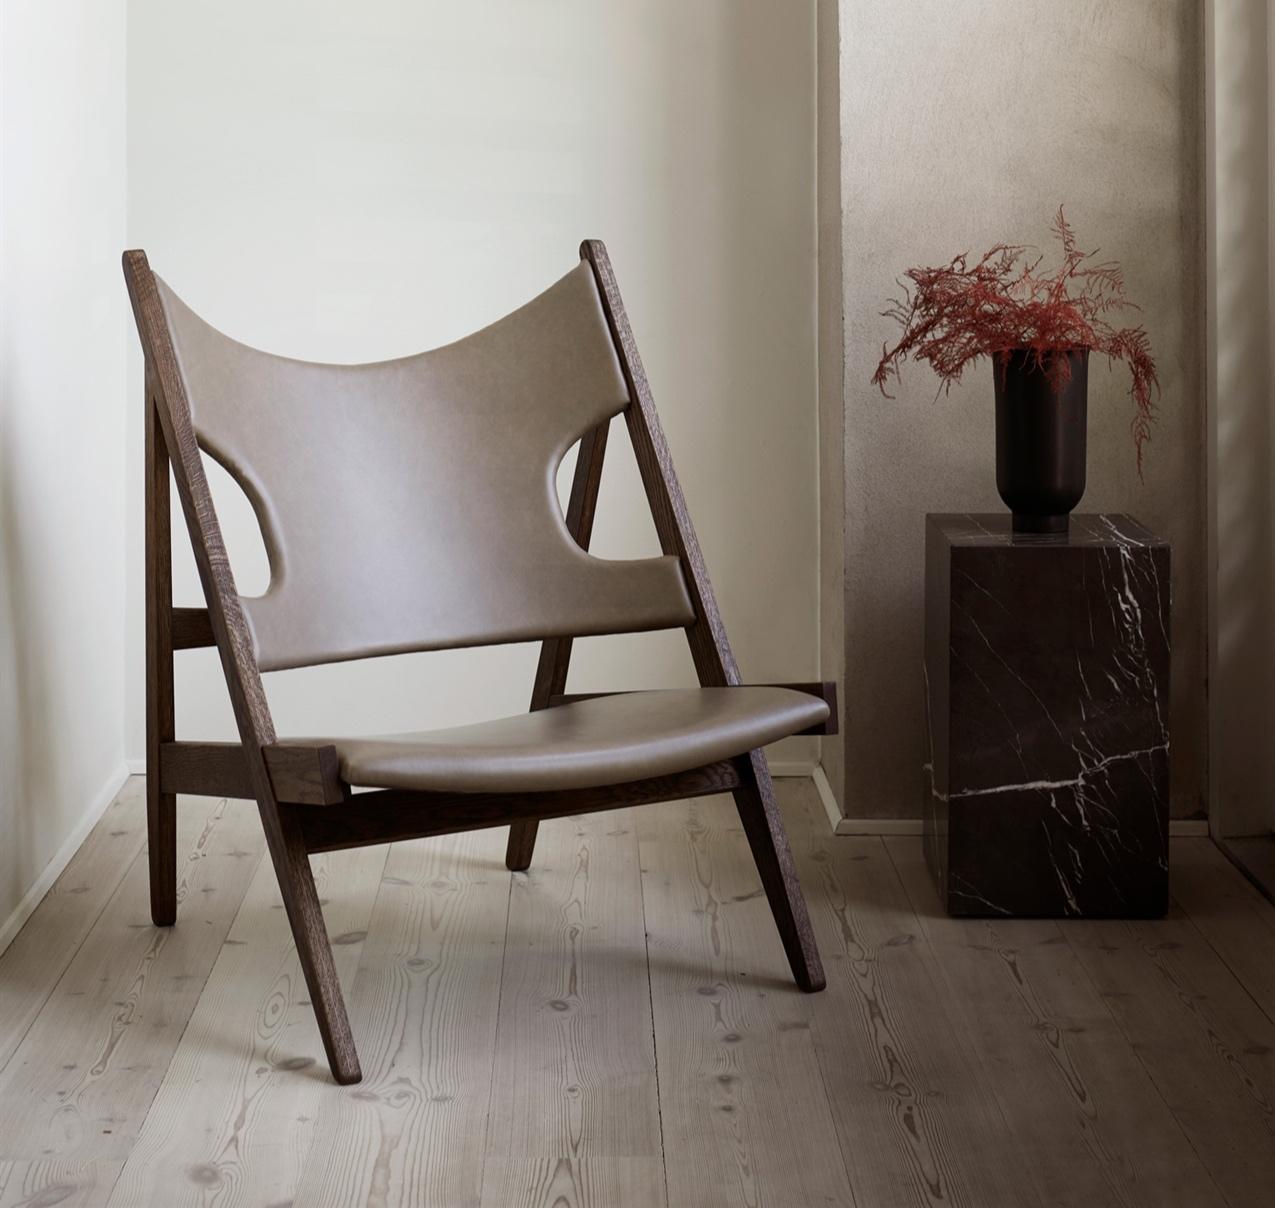 MENU_Knitting-Chair_Plinth_Cyclades.jpg